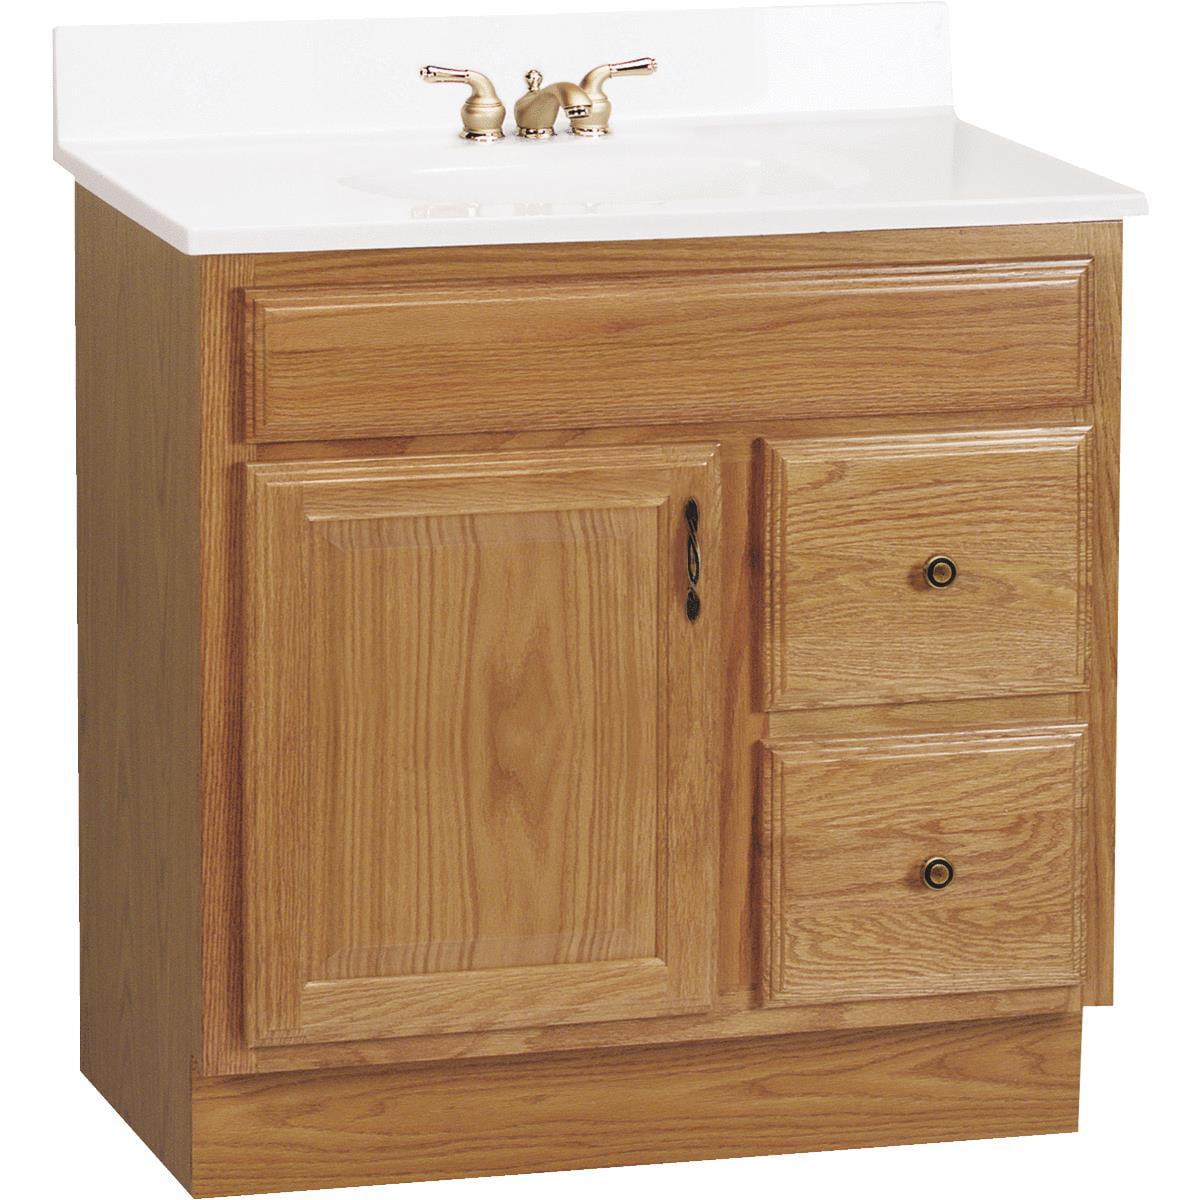 Continental Cabinets Wilmington 30 Vanity & Top Combo